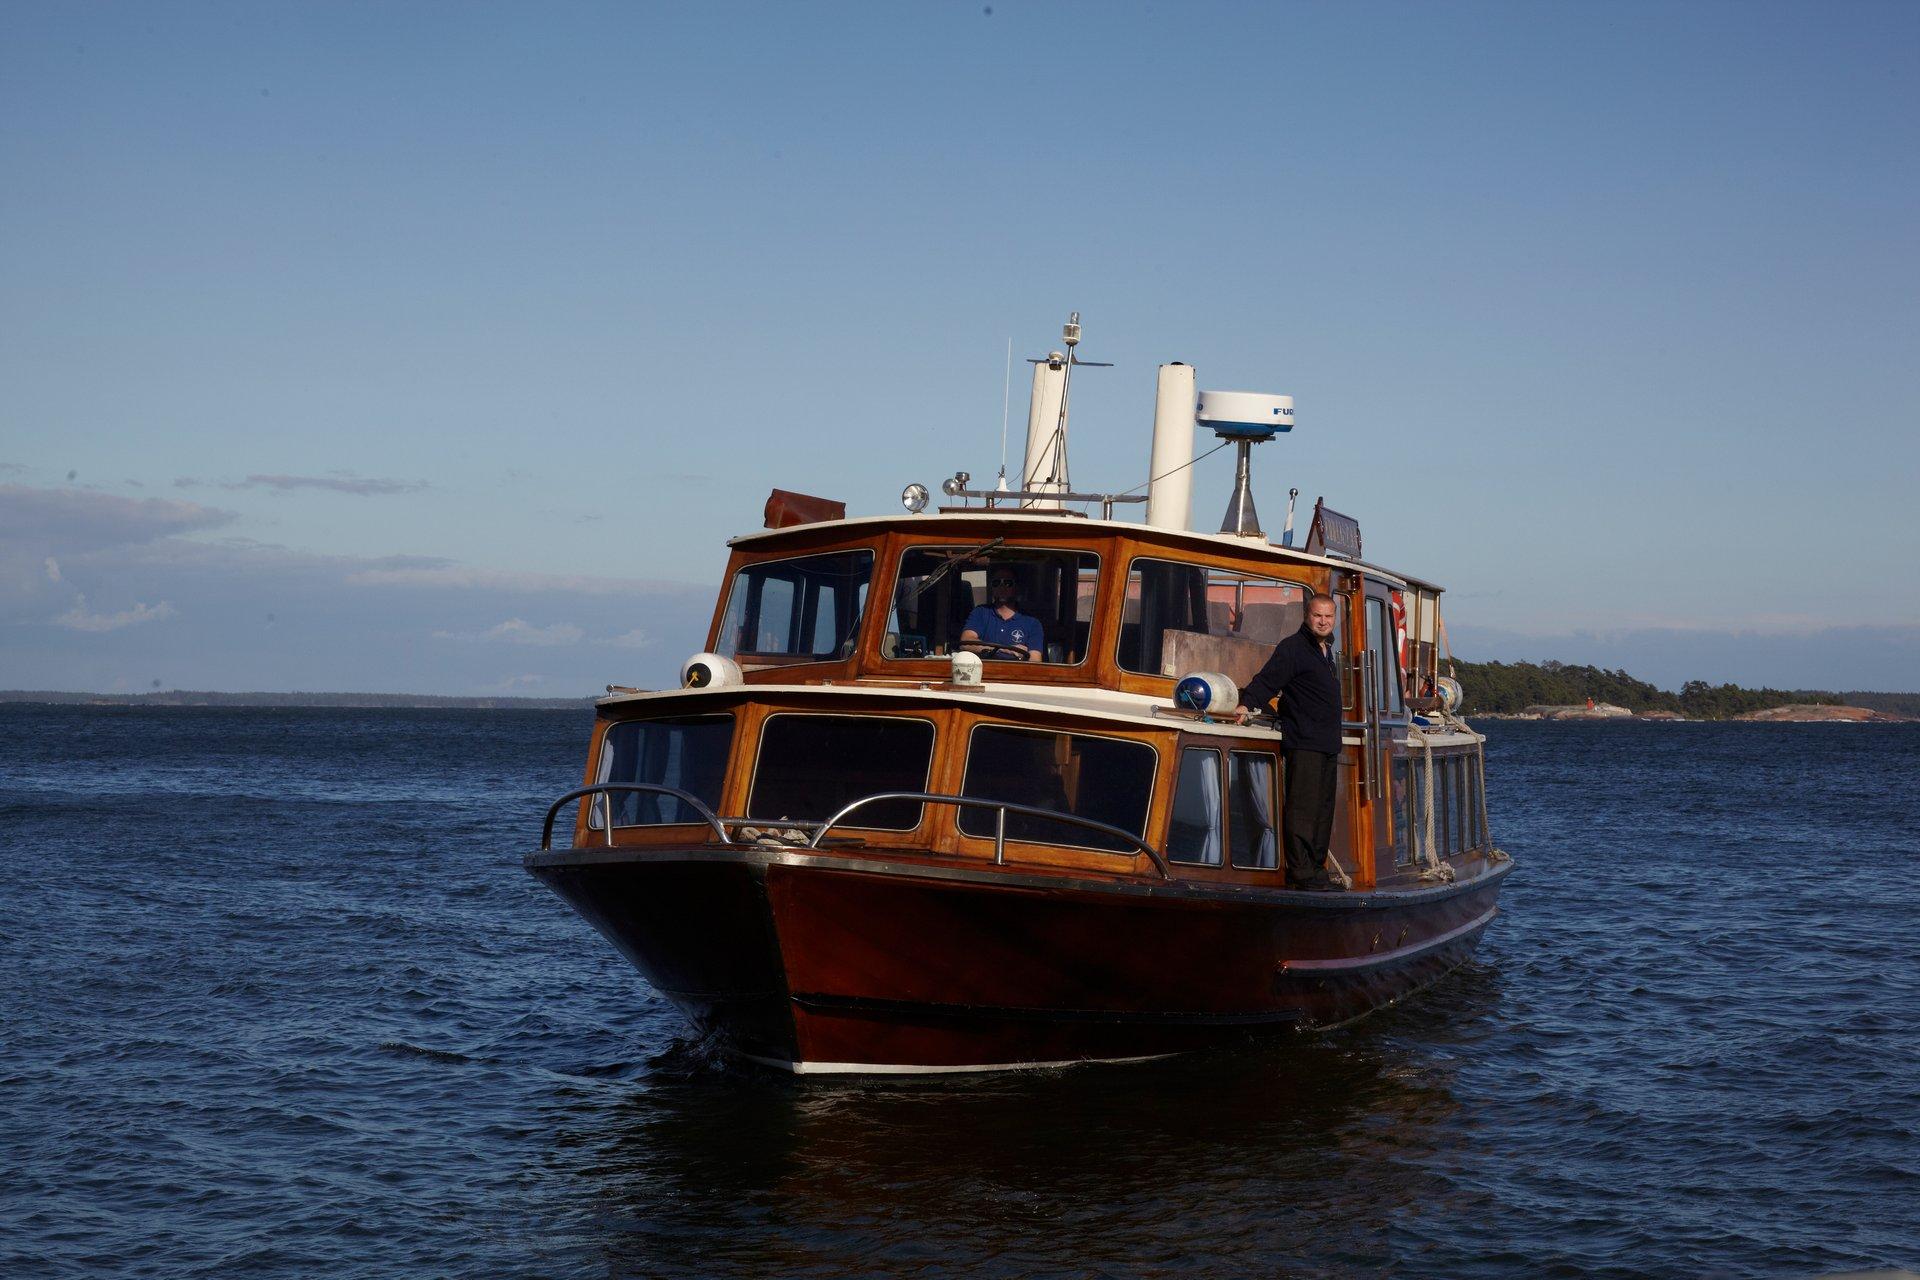 Boat trip to Kaunissaari Island near Helsinki city 2020